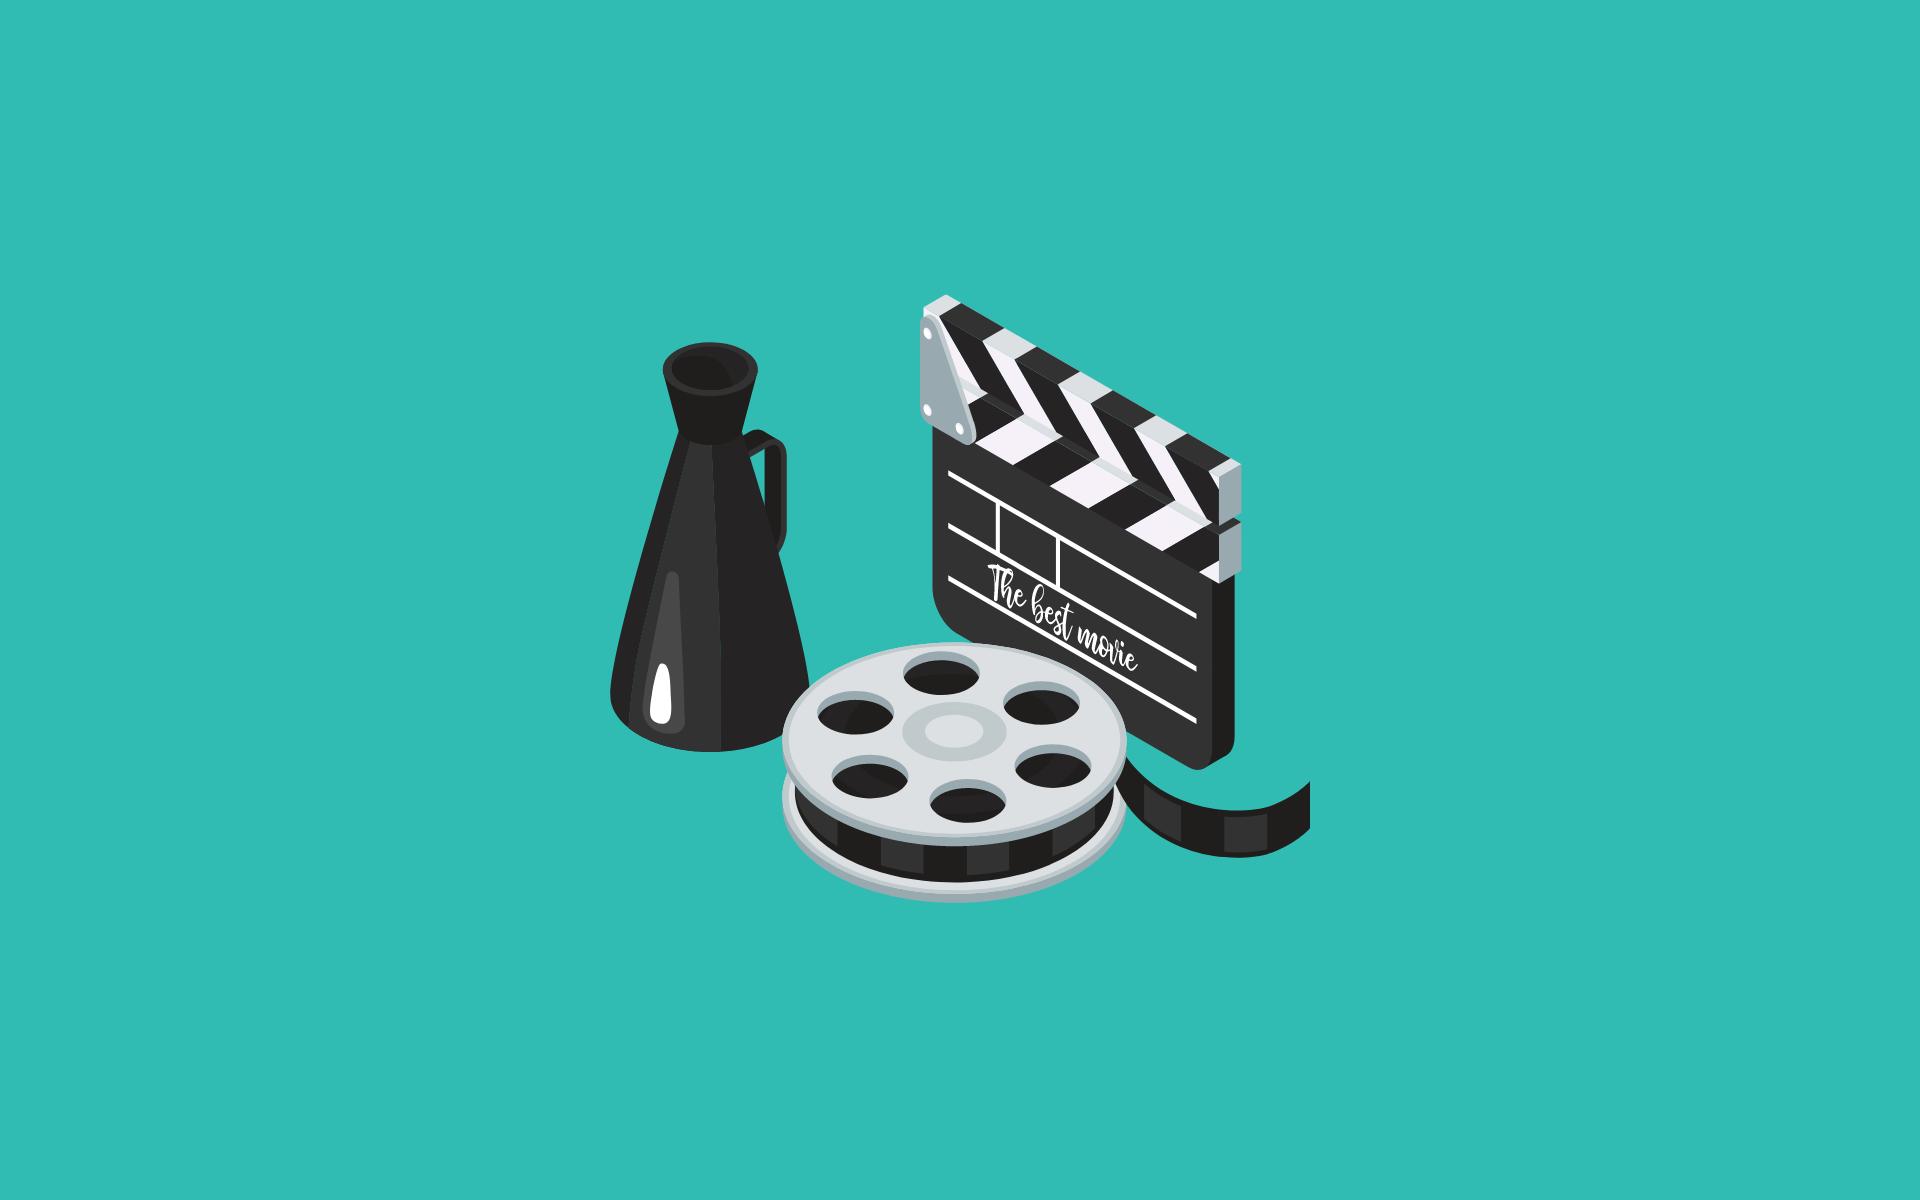 Ep.152 – Telling stories through video with Dan Bennett